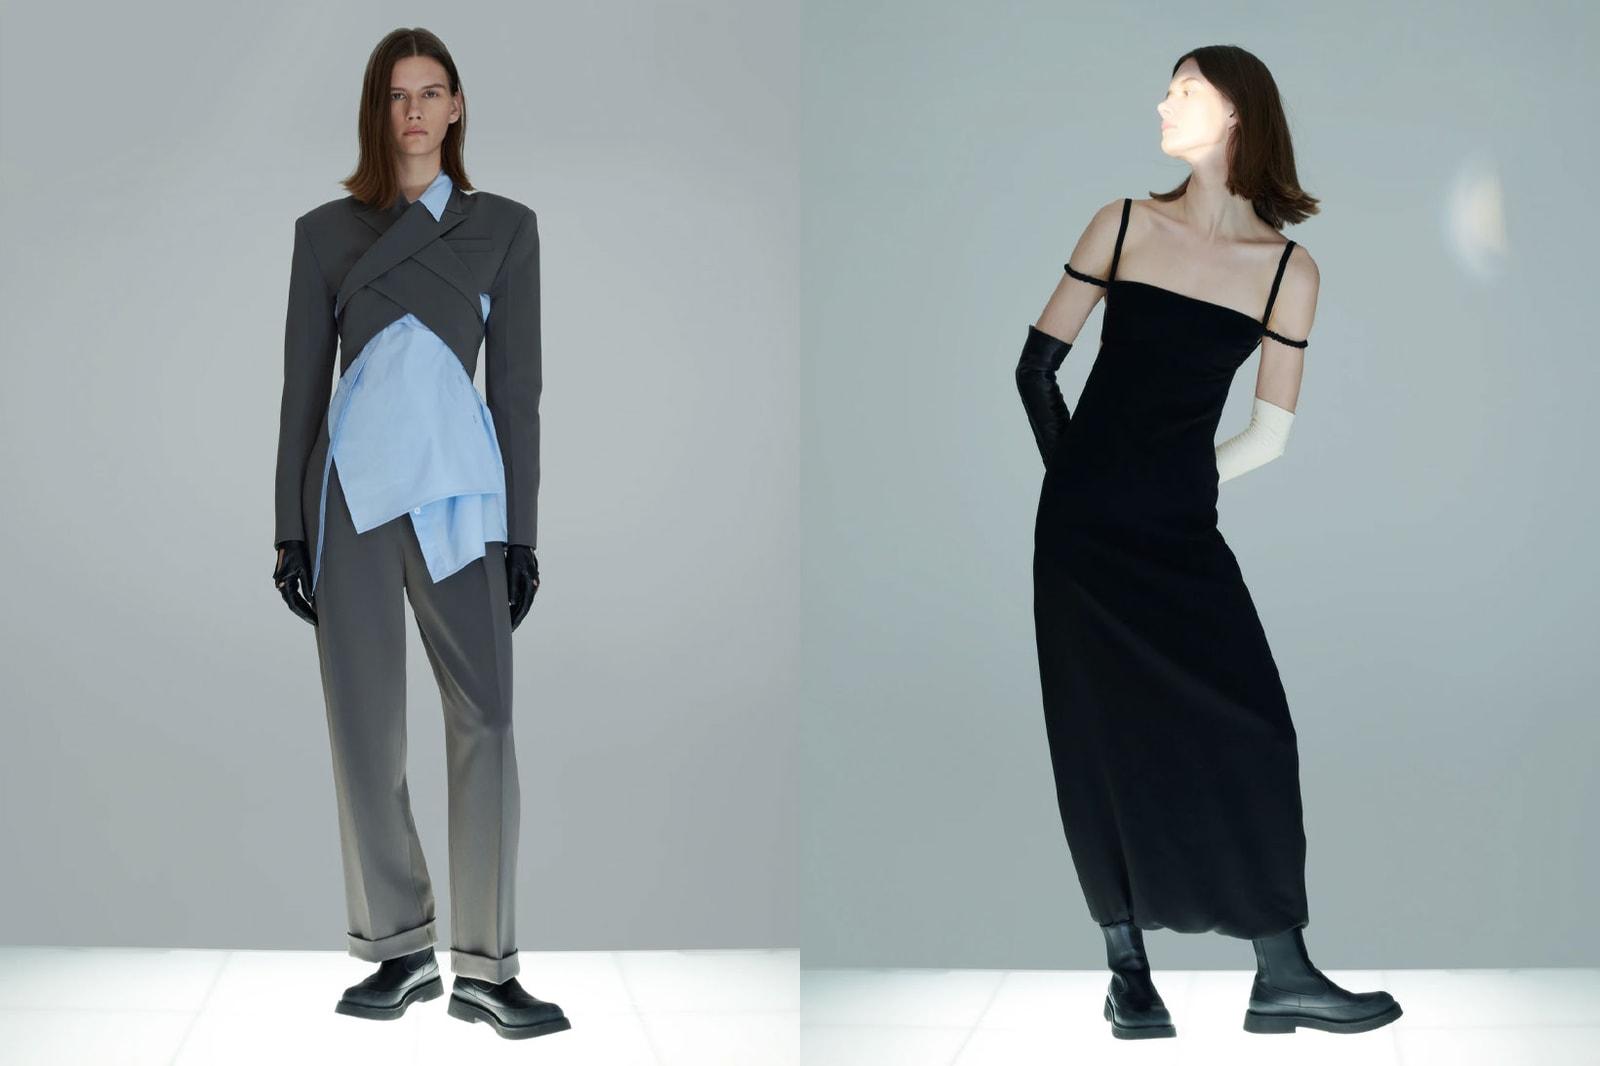 korean fashion emerging female fashion designers brands moon choi blazer black dress